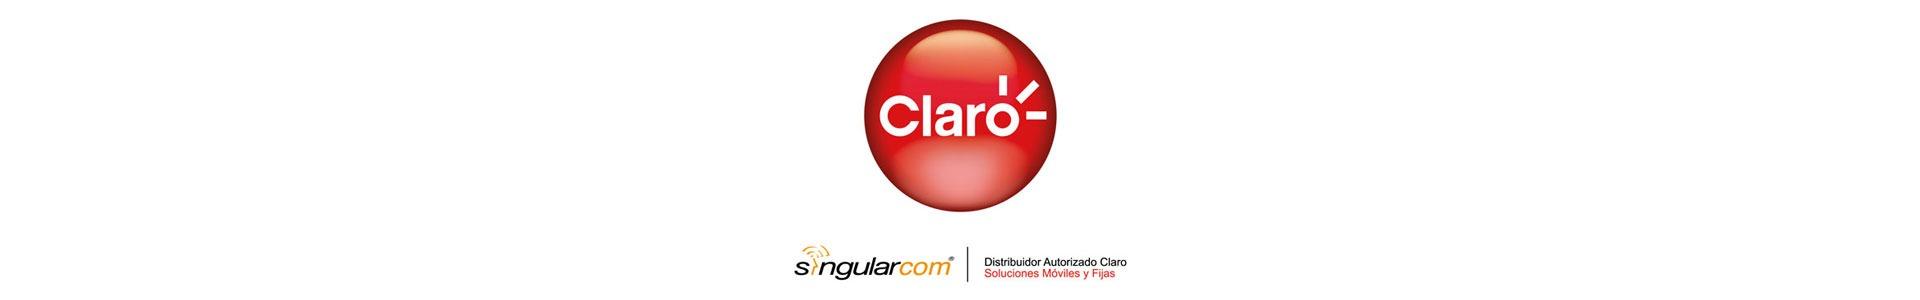 Singularcom